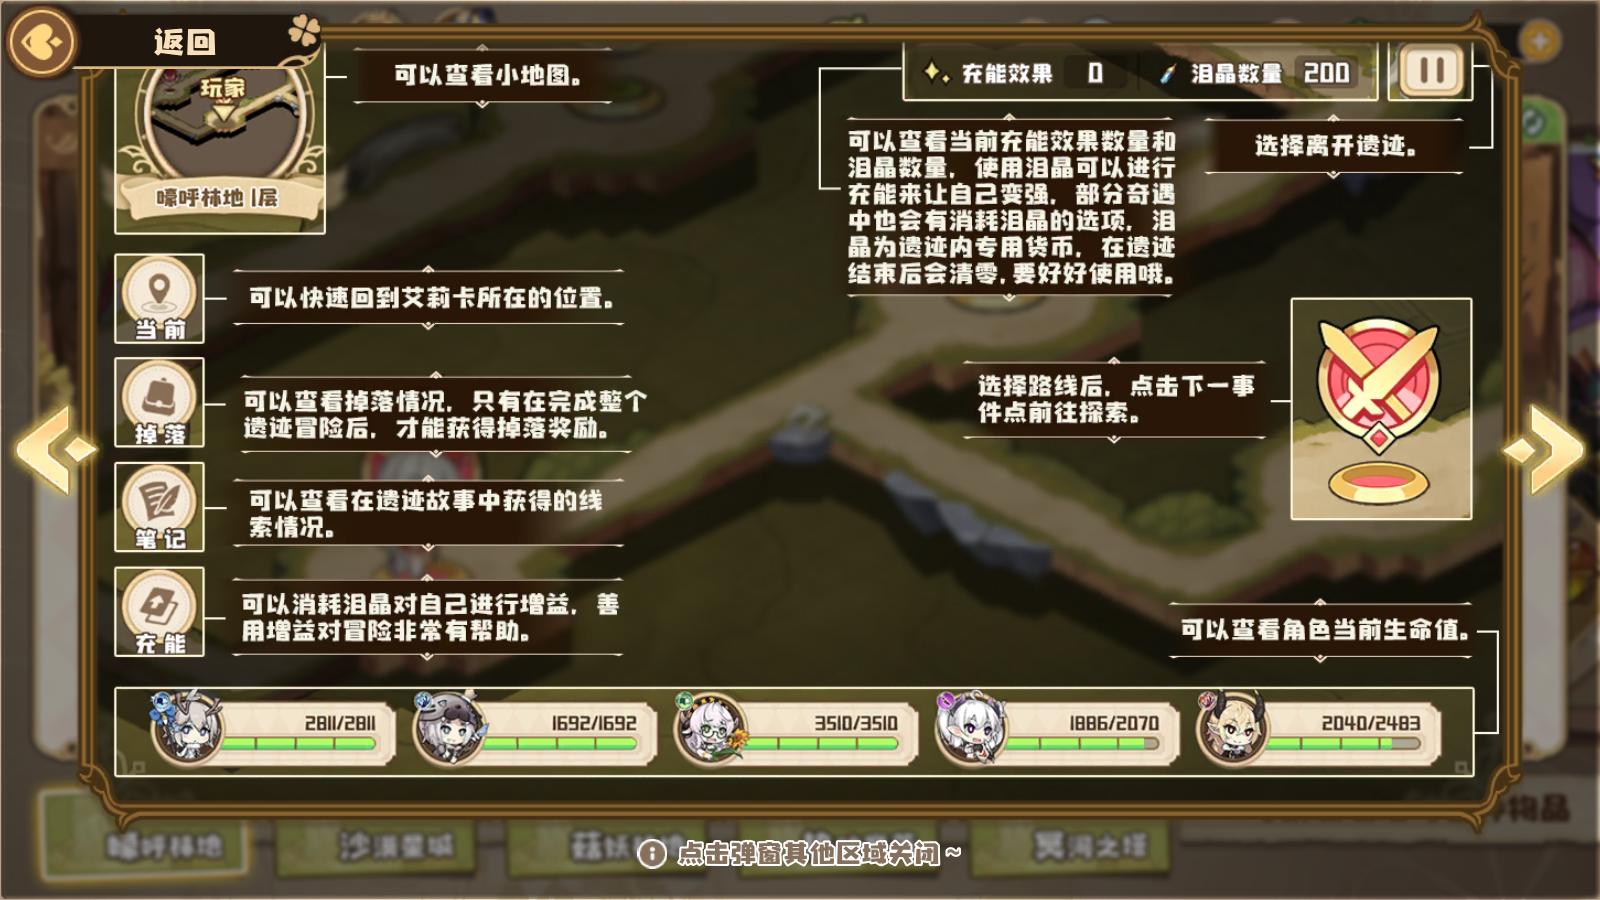 Screenshot 20210221-134110.png